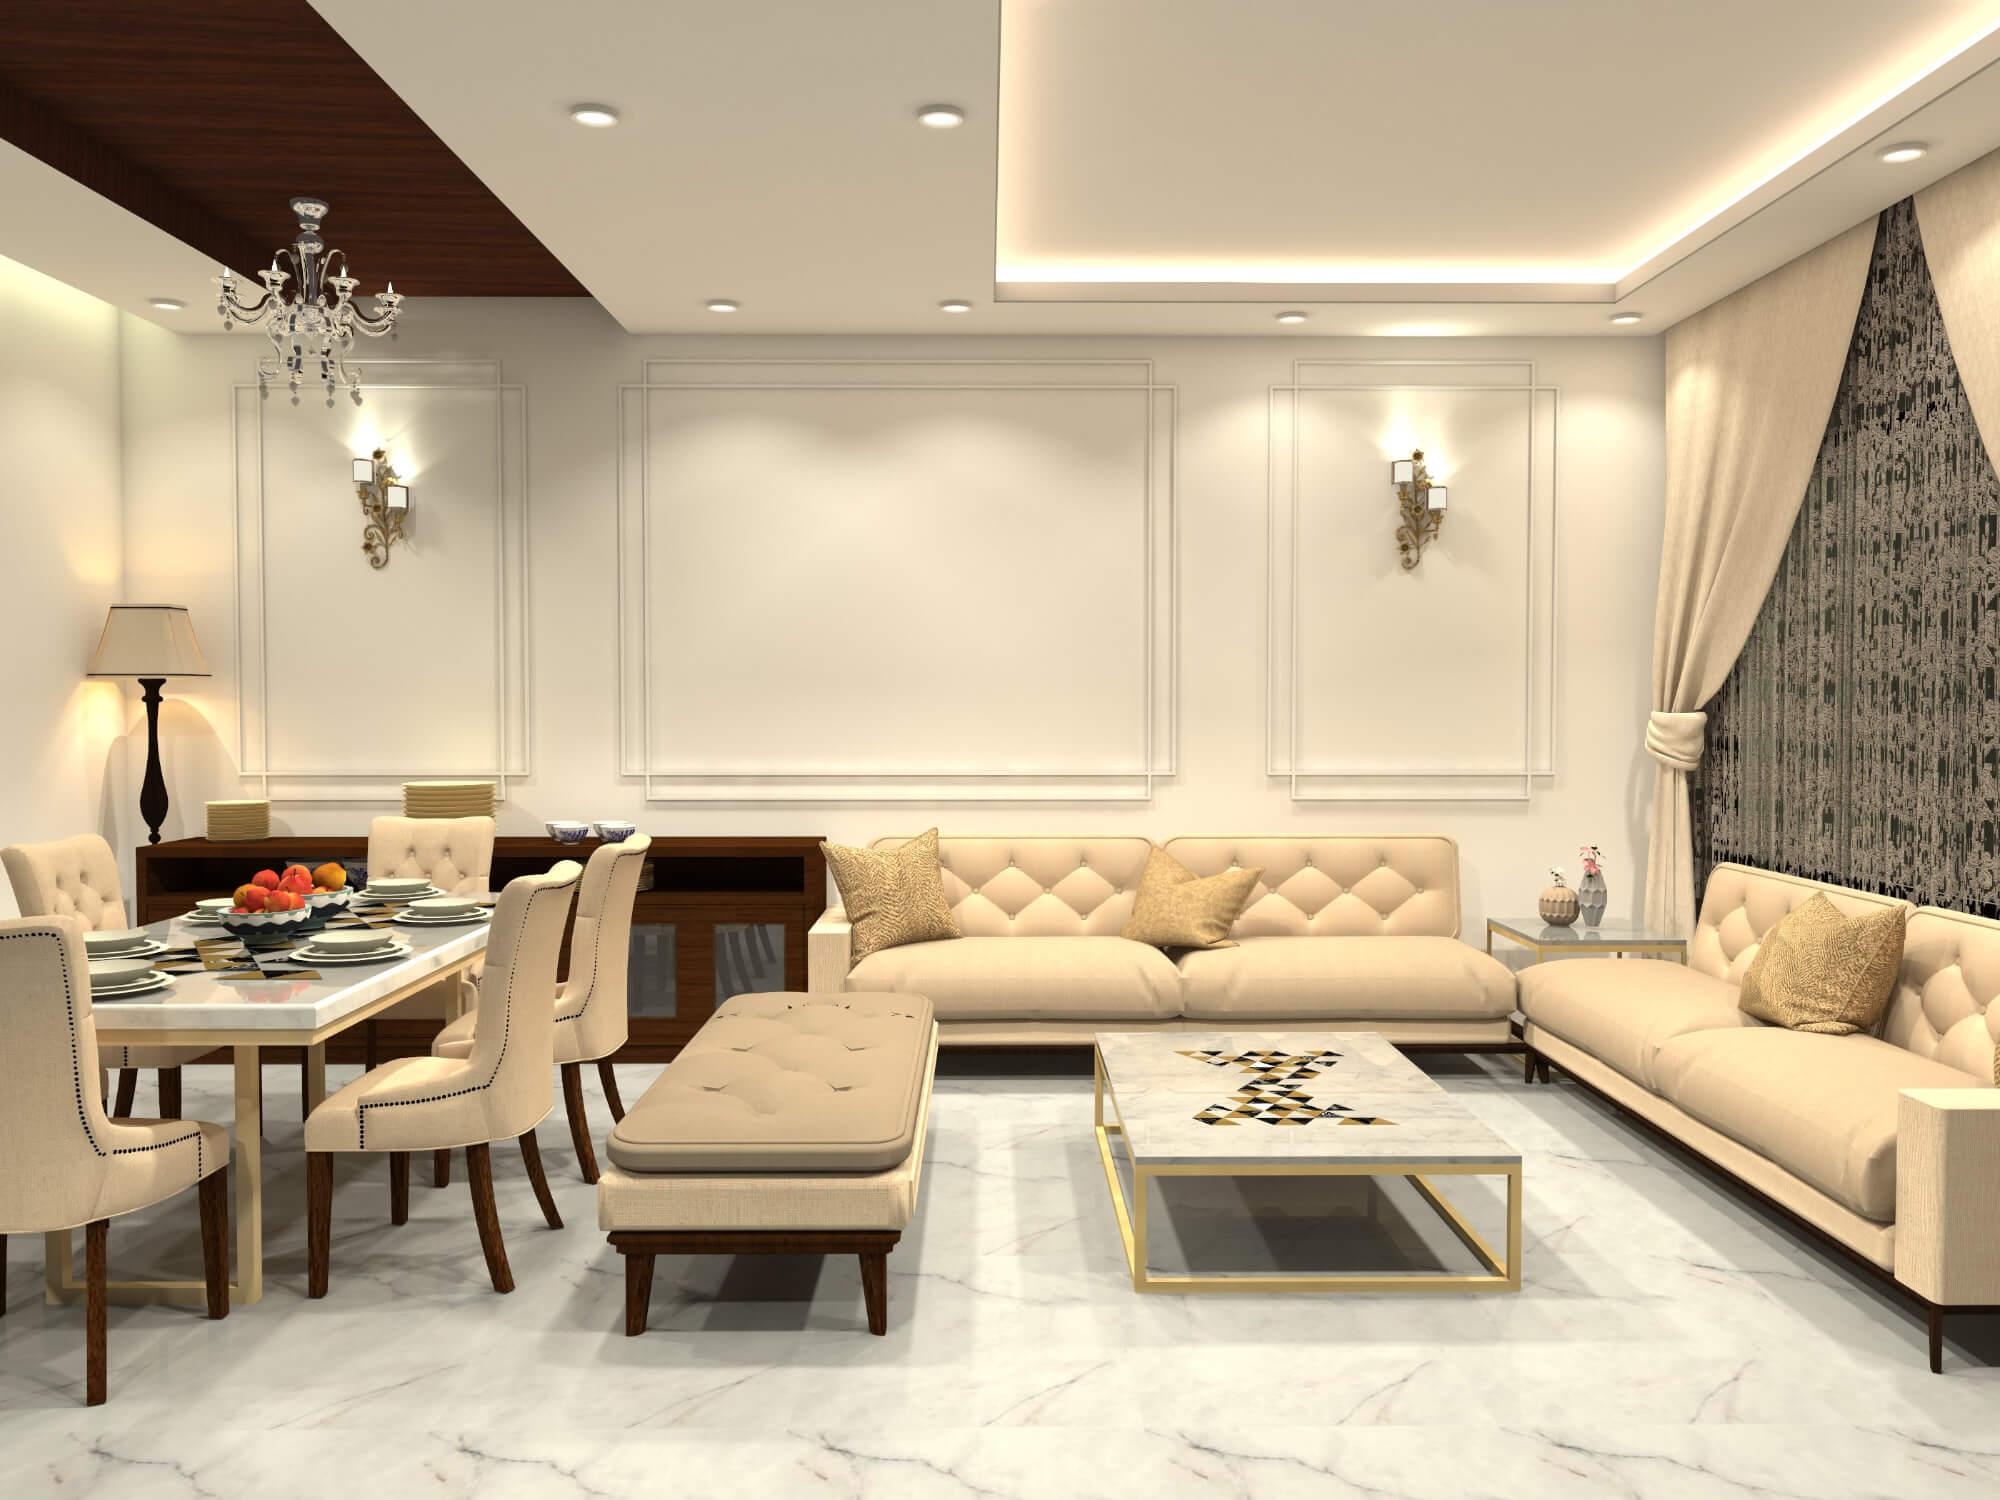 The Retirement Home - Sahiba's Designer Studio - Best Interior Designer In Jaipur - Projects